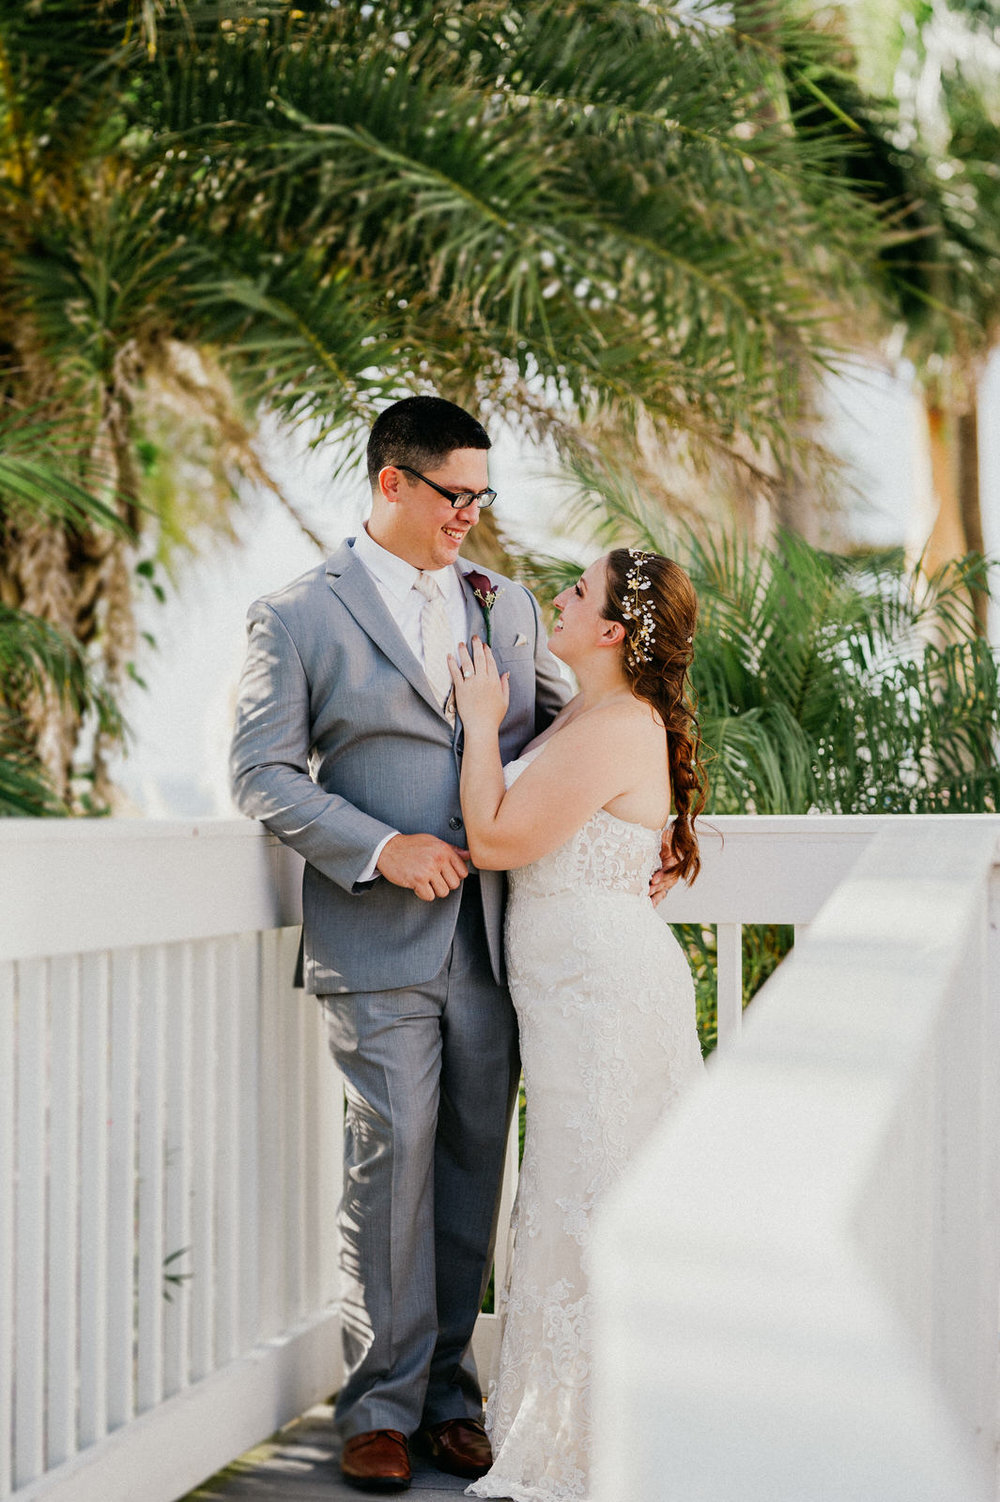 Mcneile_Photography_Wedding35.jpg